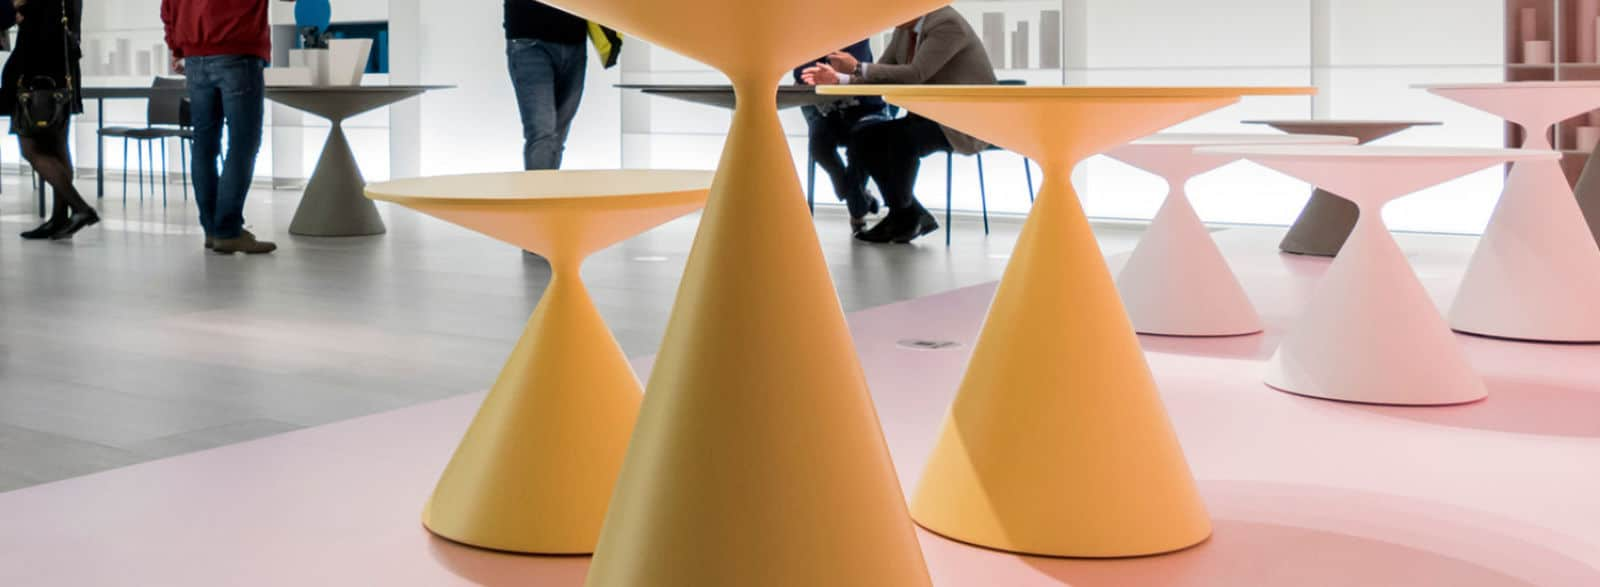 salon milan euroluce 2017 bechard sarl. Black Bedroom Furniture Sets. Home Design Ideas